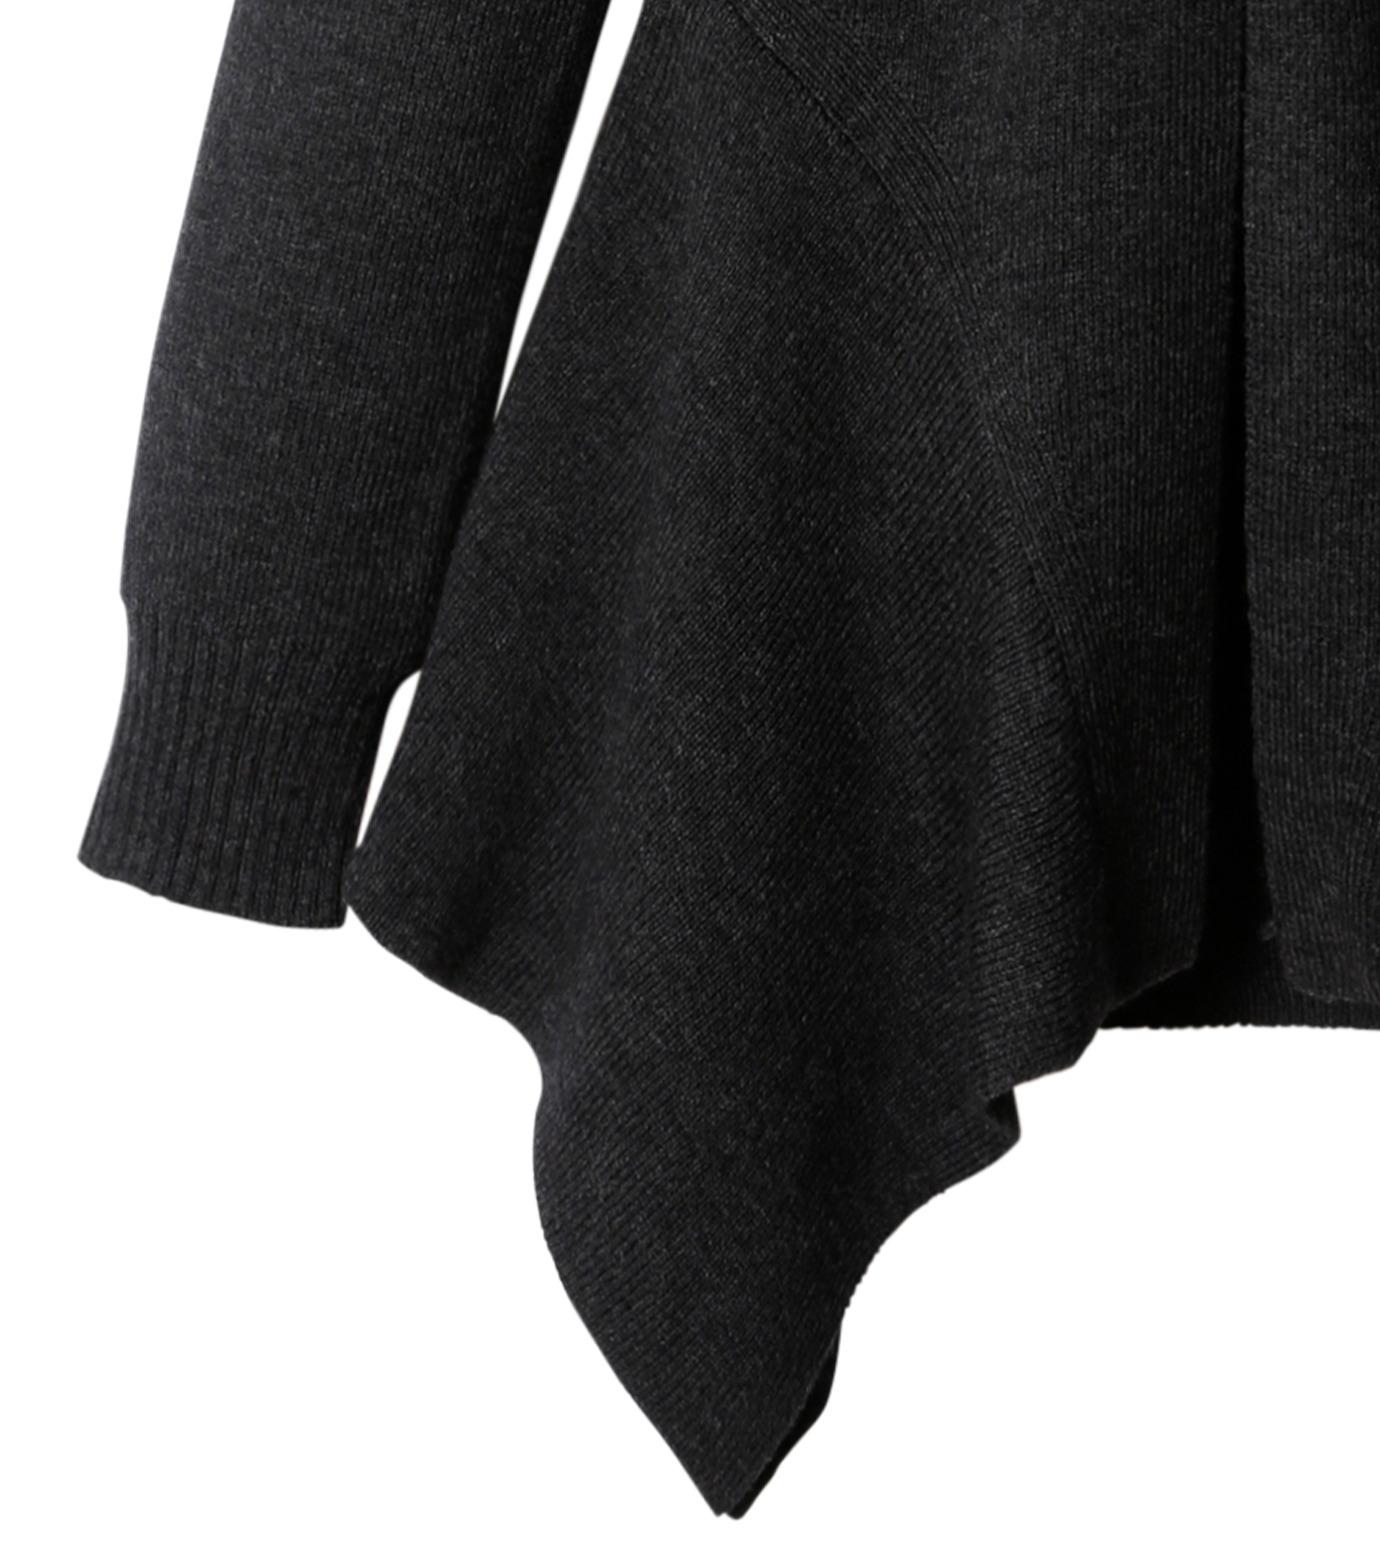 AKANE UTSUNOMIYA(アカネウツノミヤ)のAsymmetry Knit Pullover-BLACK(ニット/knit)-W16FK221010-13 拡大詳細画像3